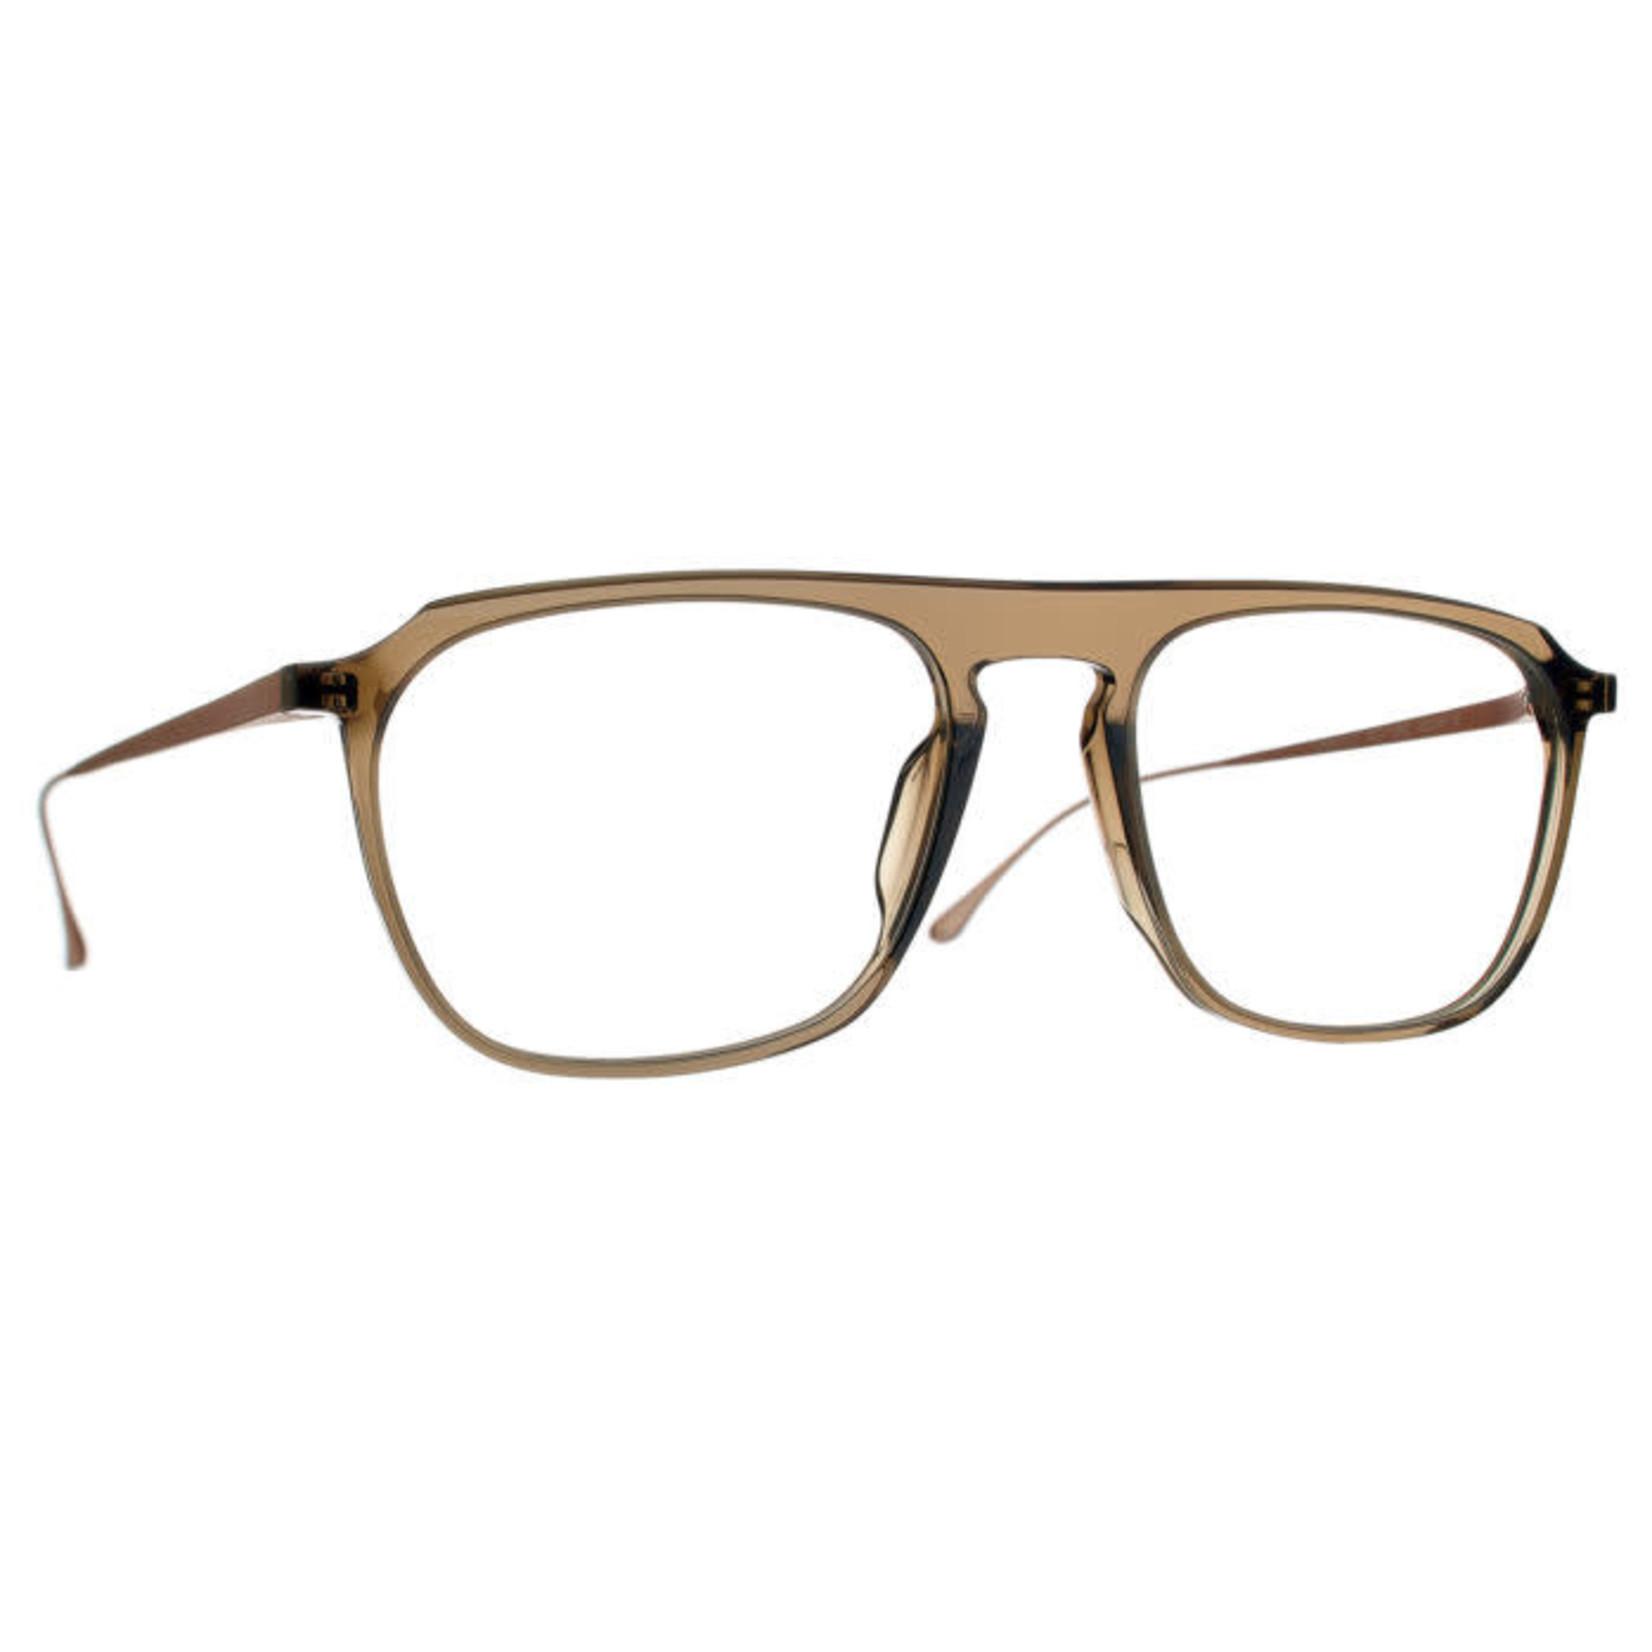 Talla Eyewear Talla Gianicolo